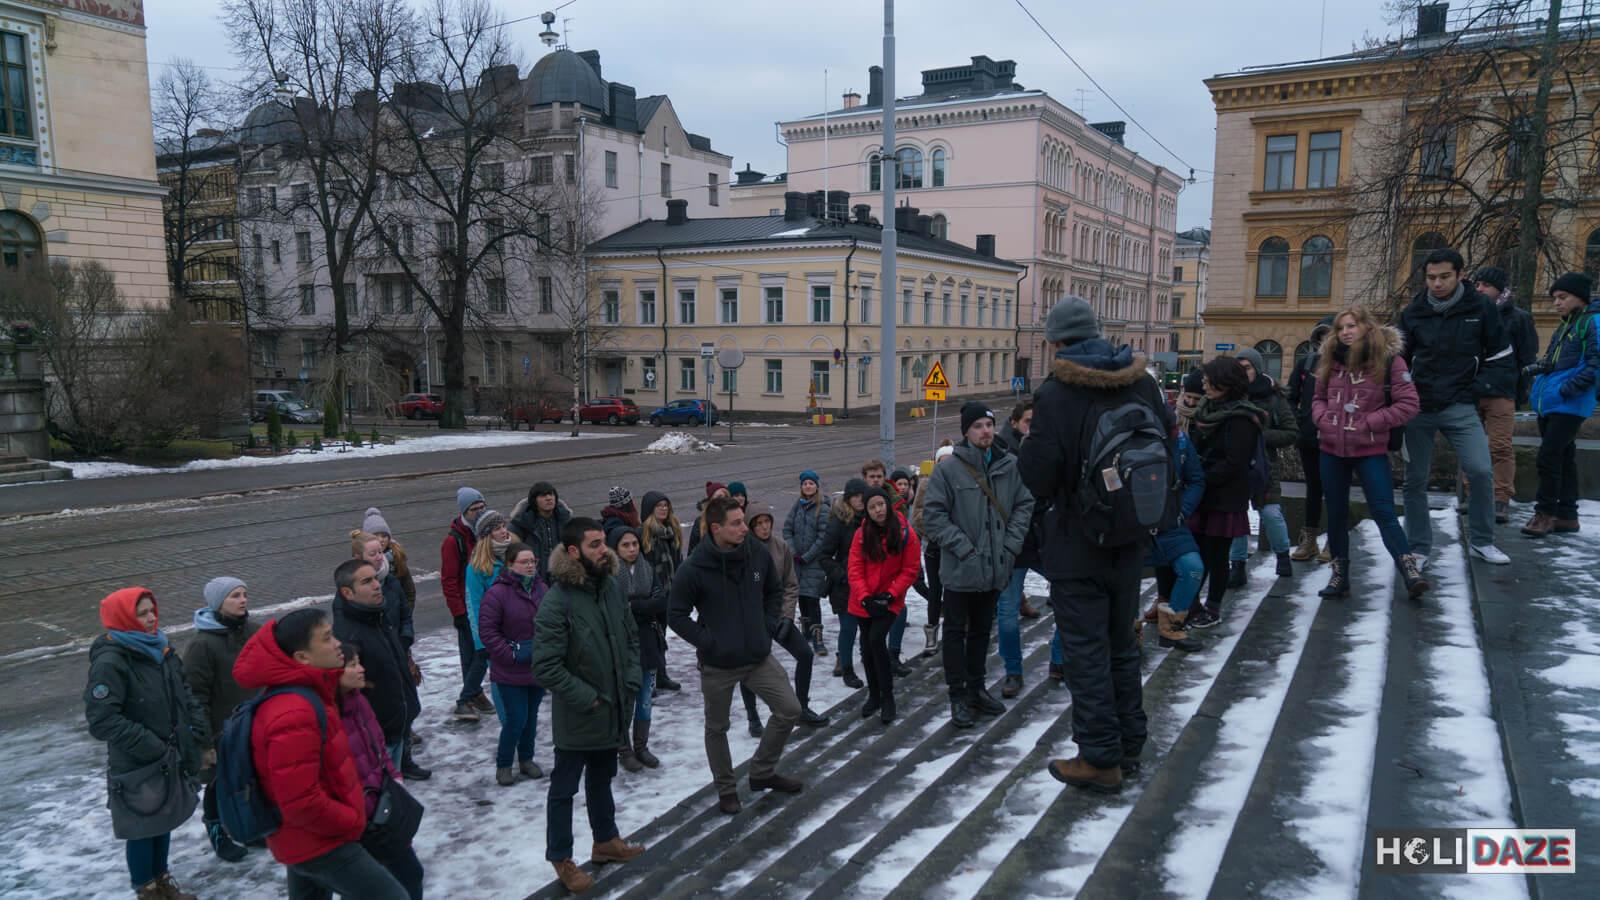 Helsinki free walking tour!